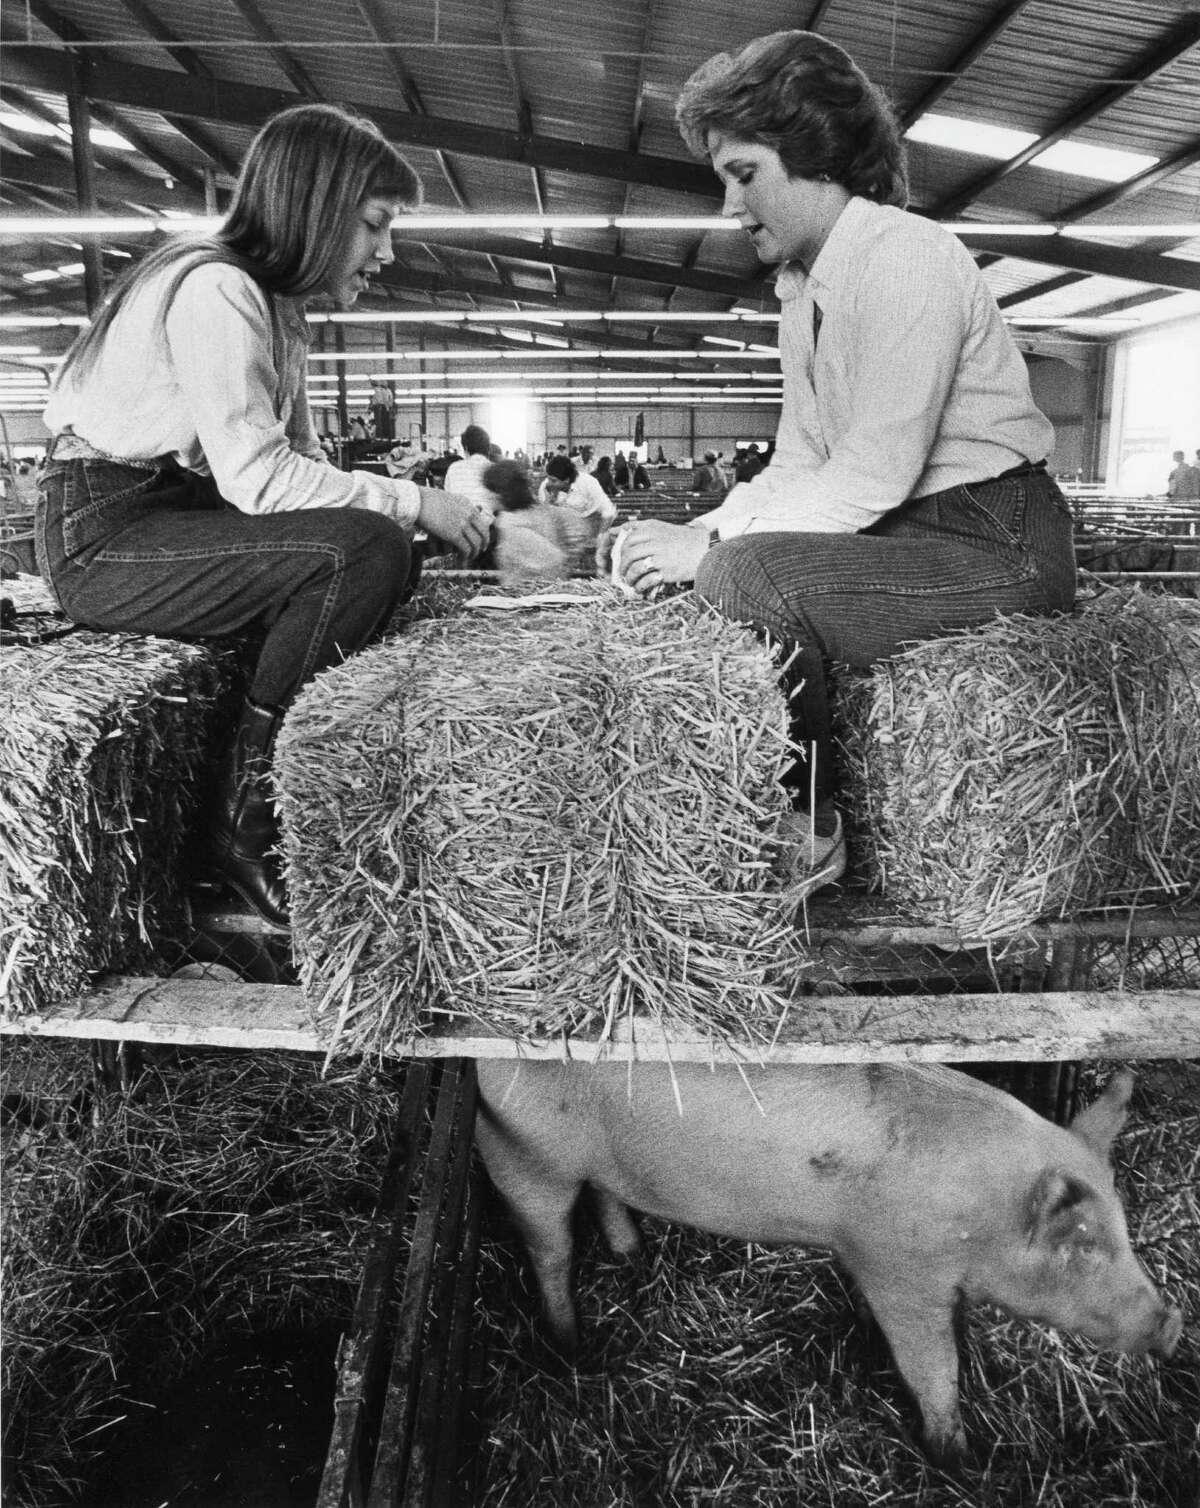 1985: Carrie Stieler and Jamie Jenschke play slapjack in the swine barn.